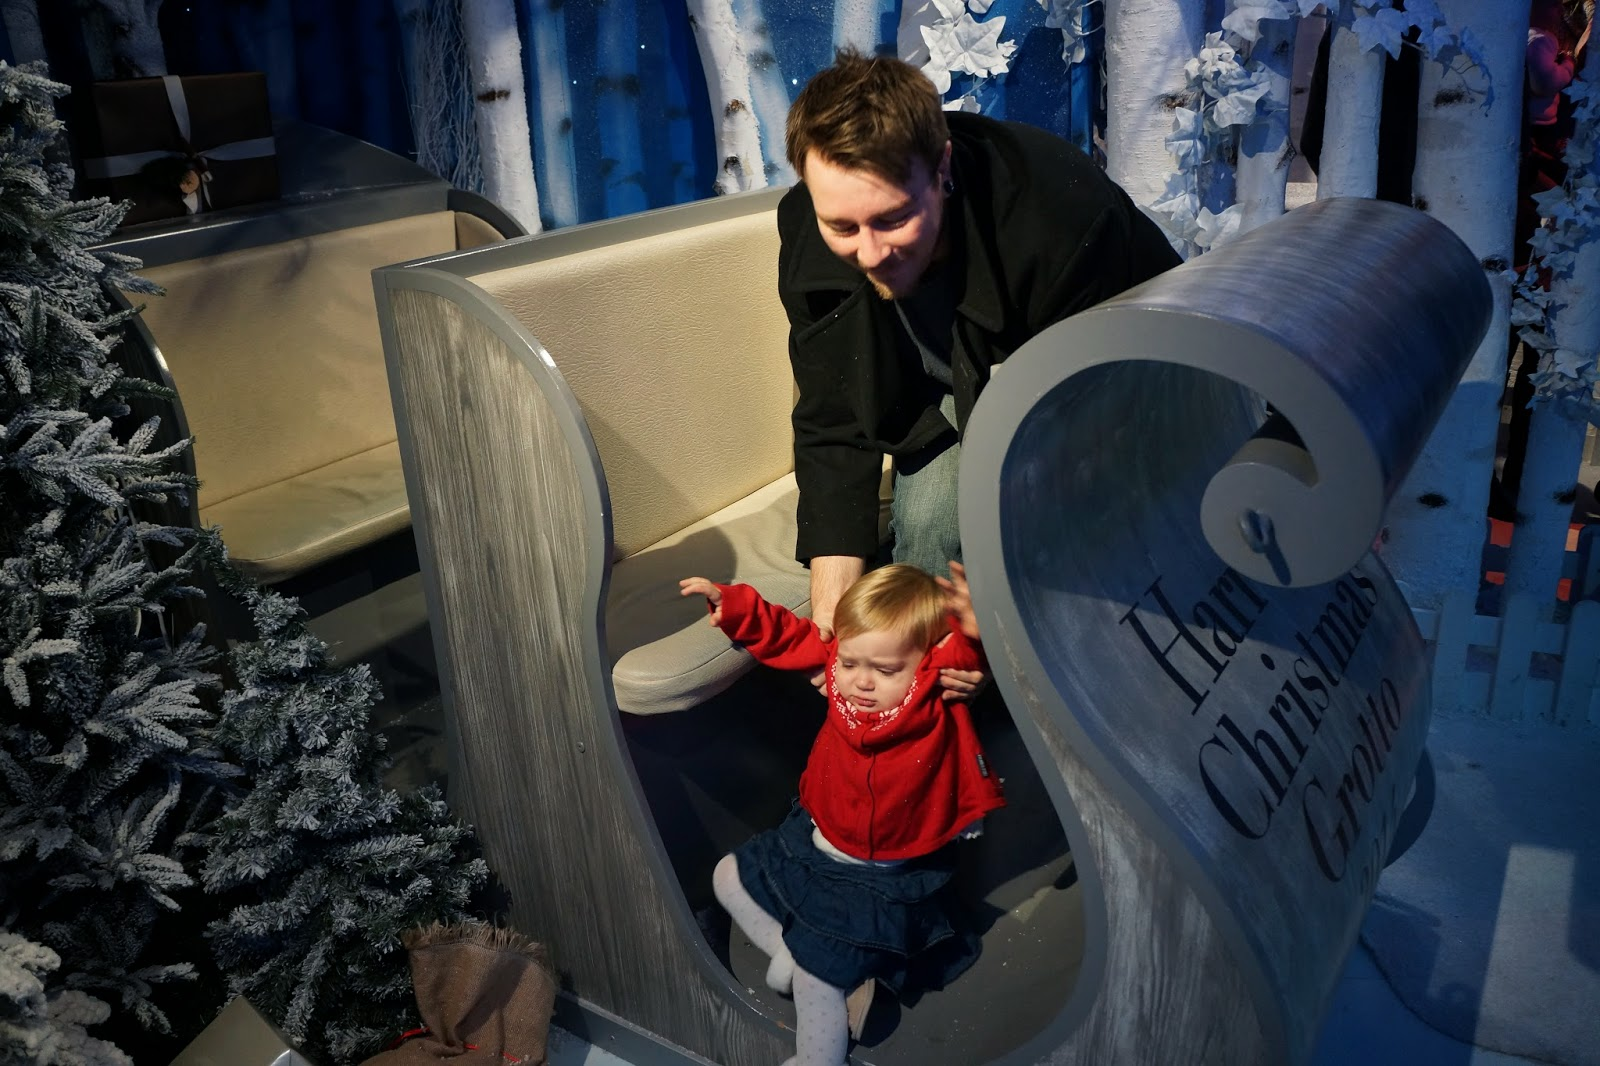 harrods christmas santa's grotto 2014 sleigh